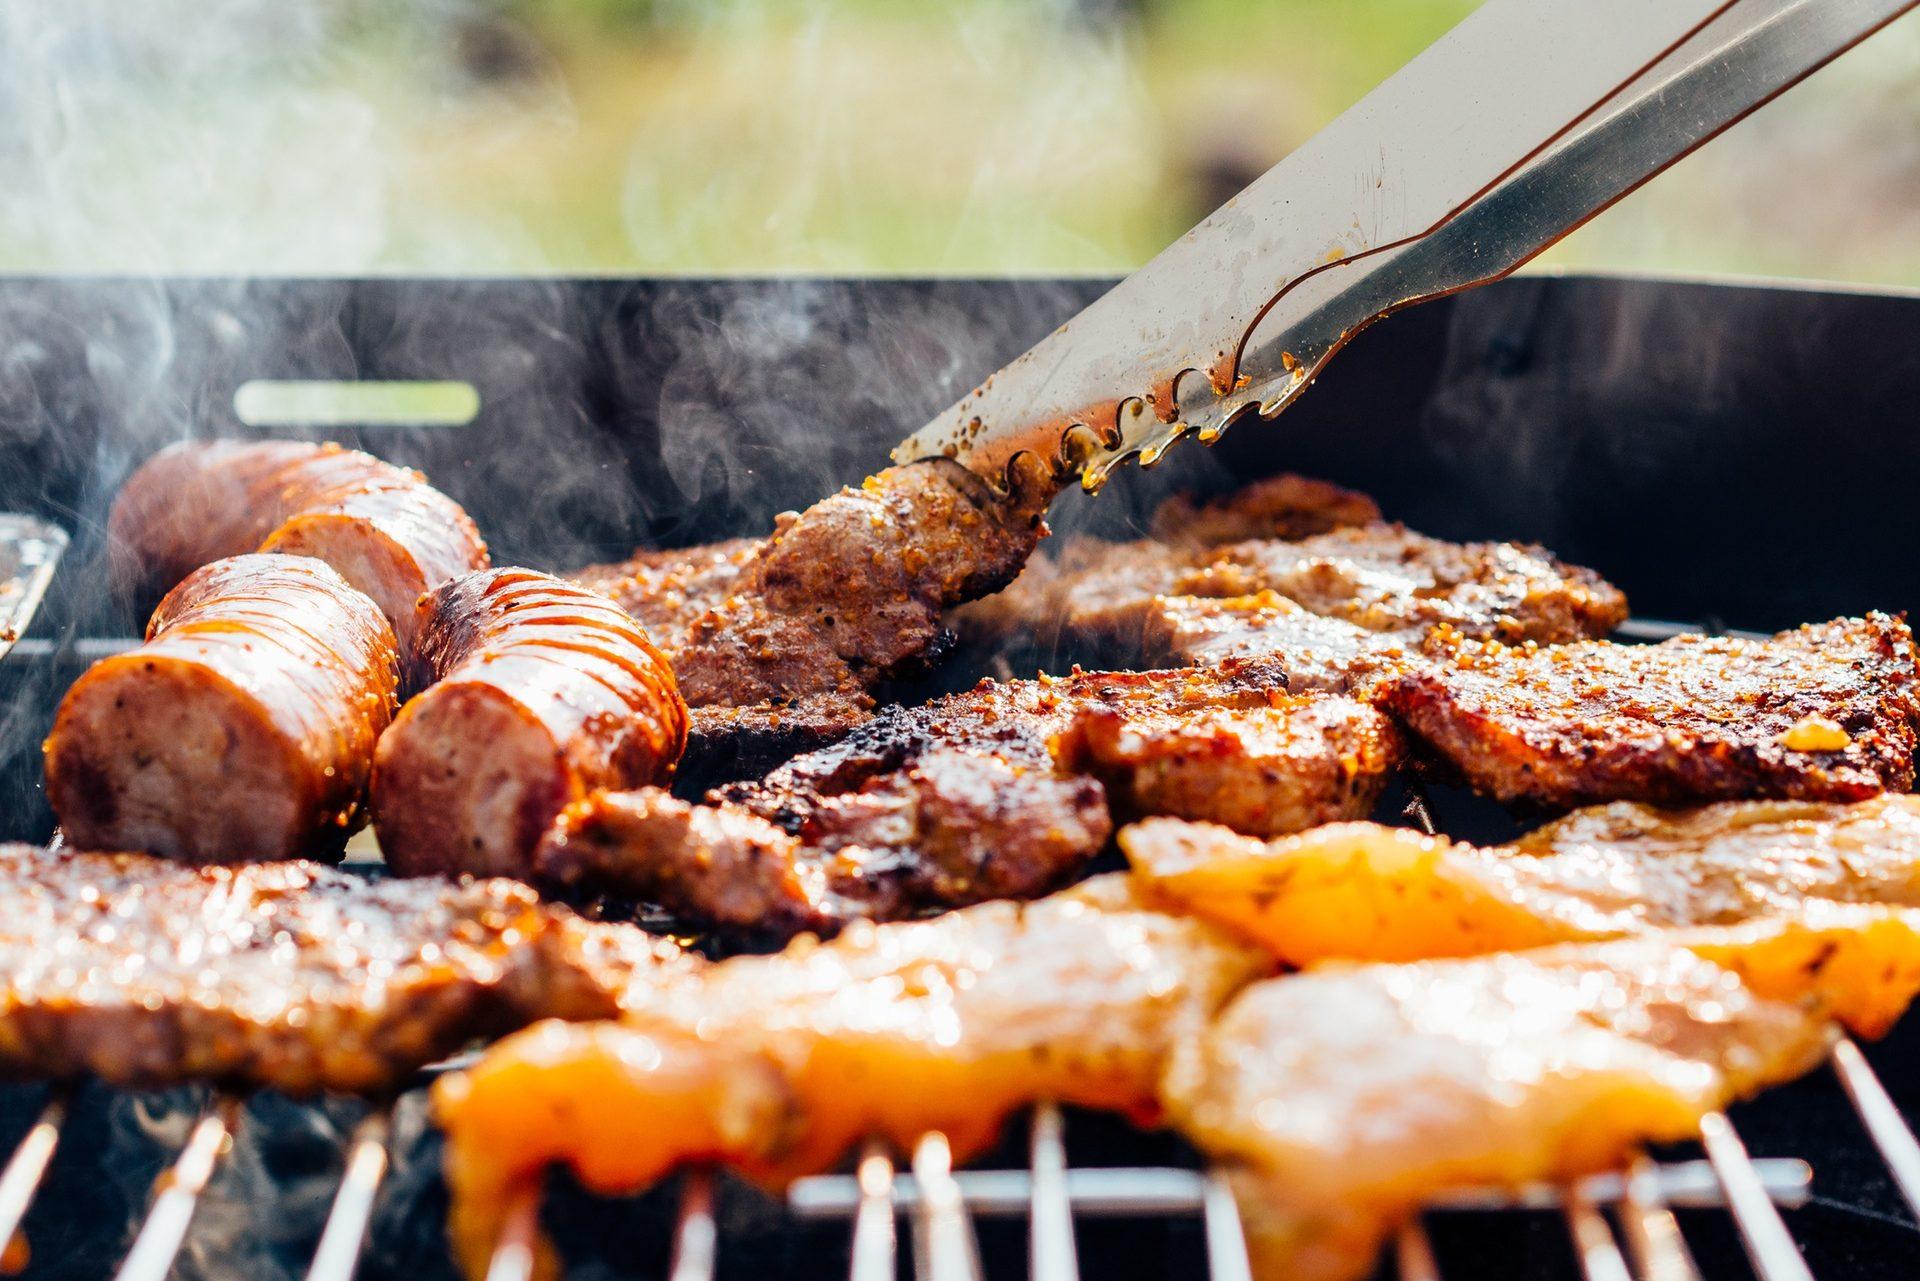 BBQ Restaurant Eetcafe Giethoorn - Burgers & Grill